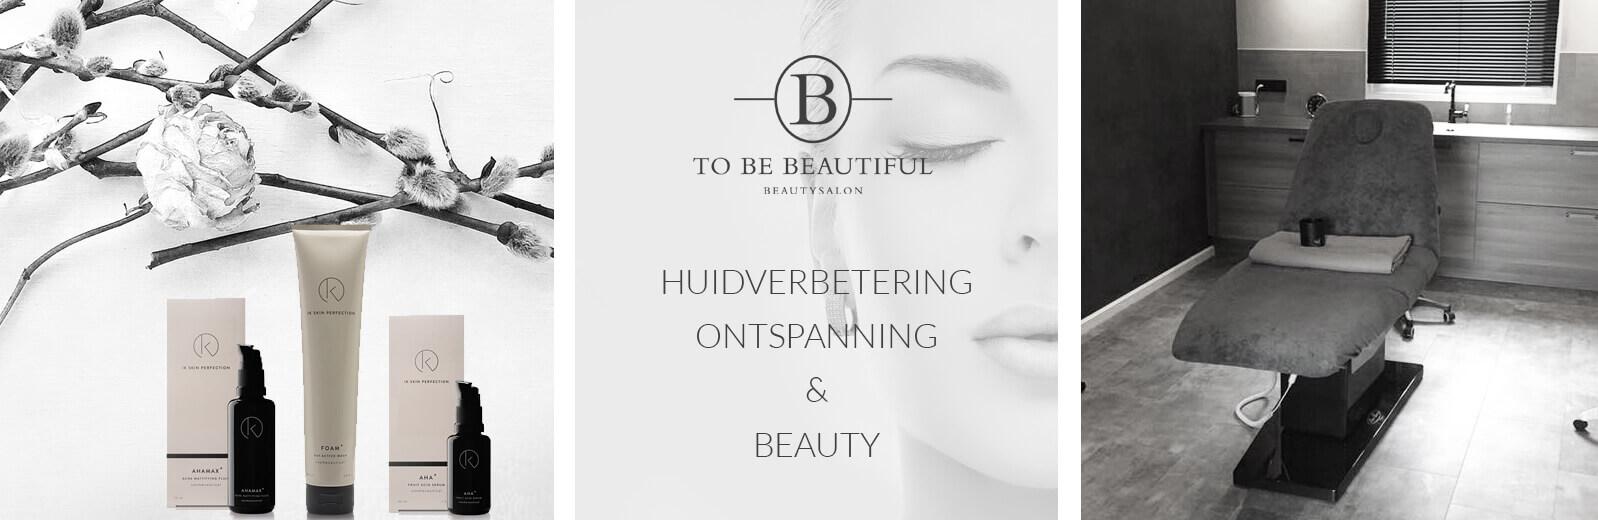 Huidverbetering, ontspanning & beauty